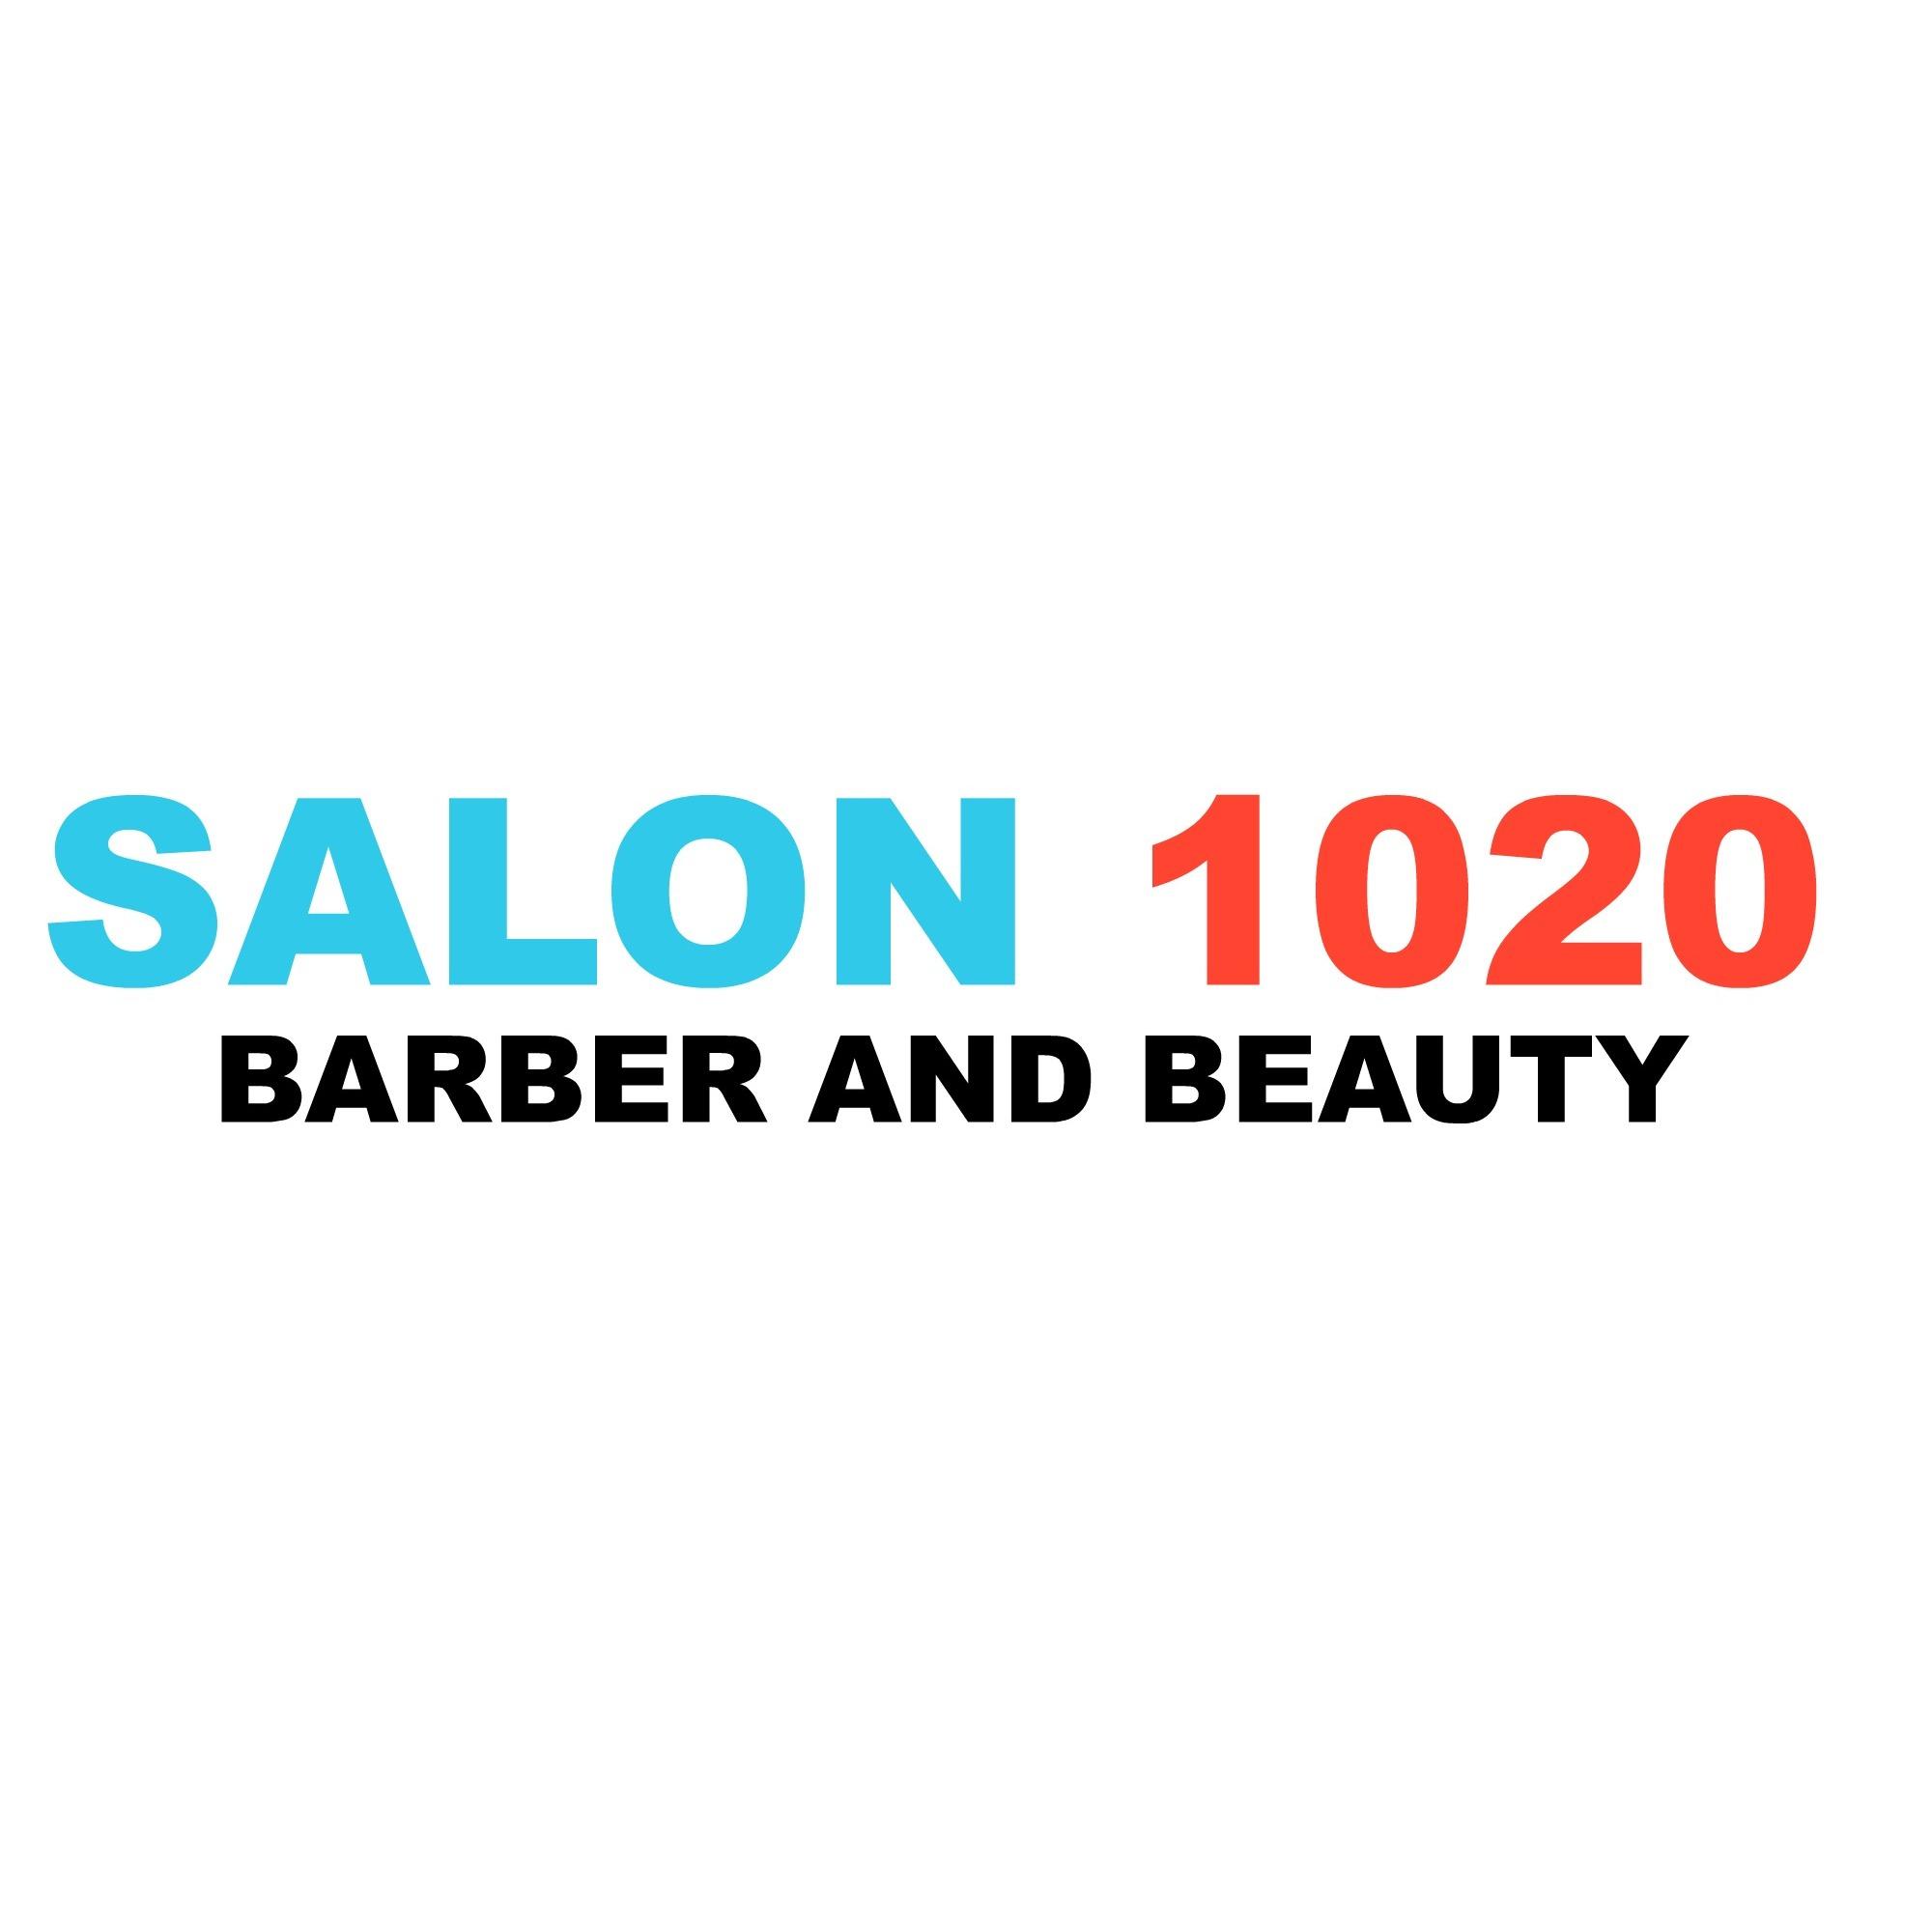 Salon 1020 Barber & Beauty